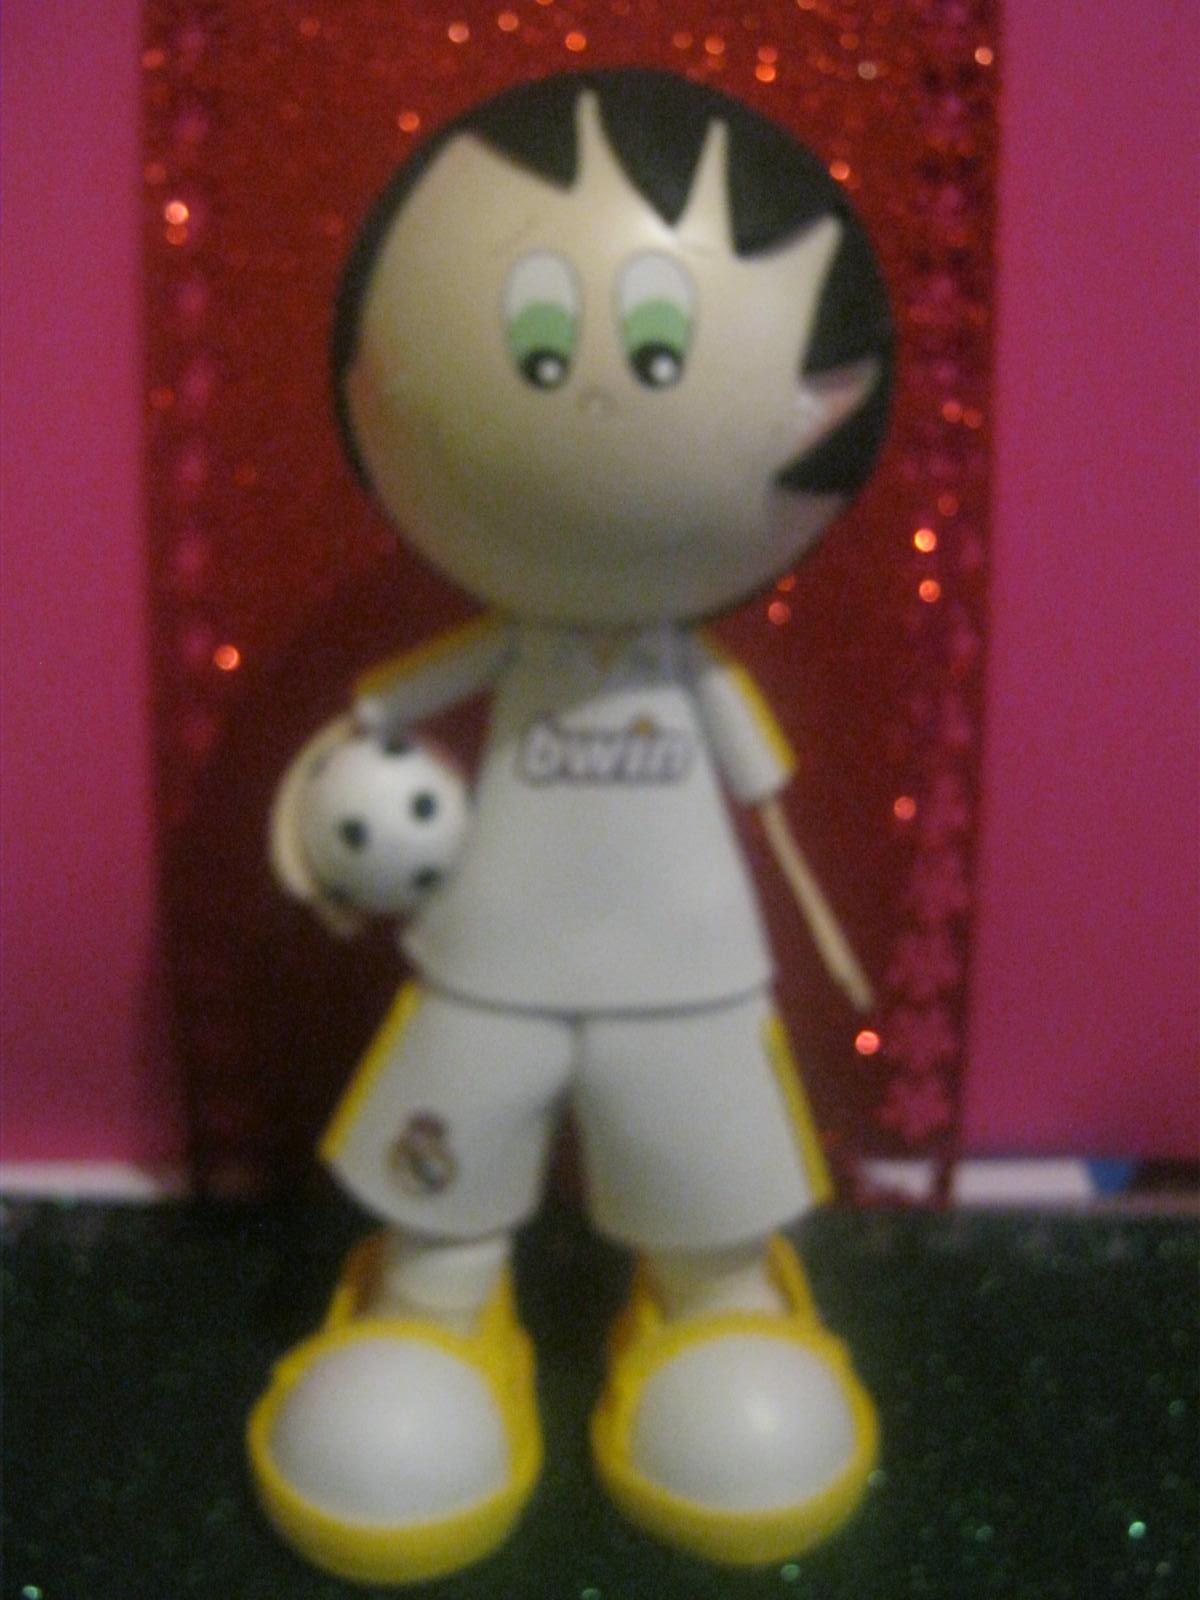 http://3.bp.blogspot.com/-Fk9oiakbPfA/UJtWvtR0heI/AAAAAAAAHqU/UN_HLz21Hik/s1600/mu%C3%B1eco+3d+doll+Fofucho+foamy+gomaeva+cristiano+ronaldo+real+madrid+fc+Artfoamicol+manualidades+hancraft+craft+patrones+balo+oro+moldes+futbolistas+2013+colombianos+0.JPG